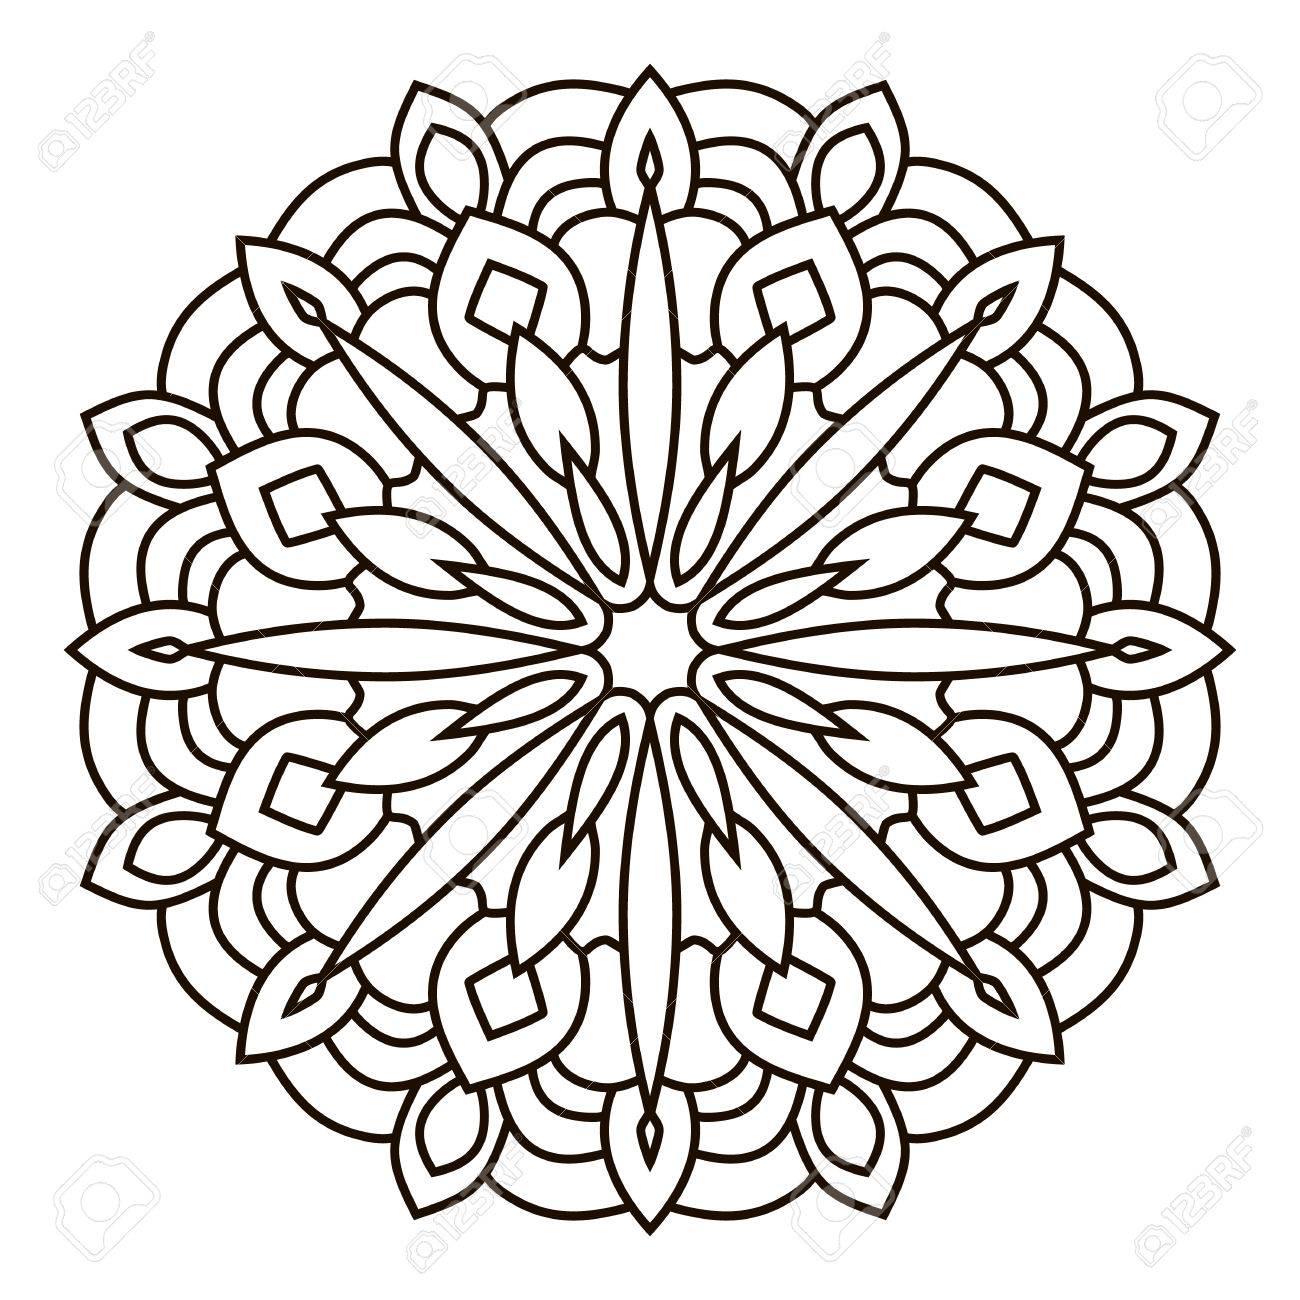 Symmetrische Kreisförmigen Muster Mandala Orientalische Muster